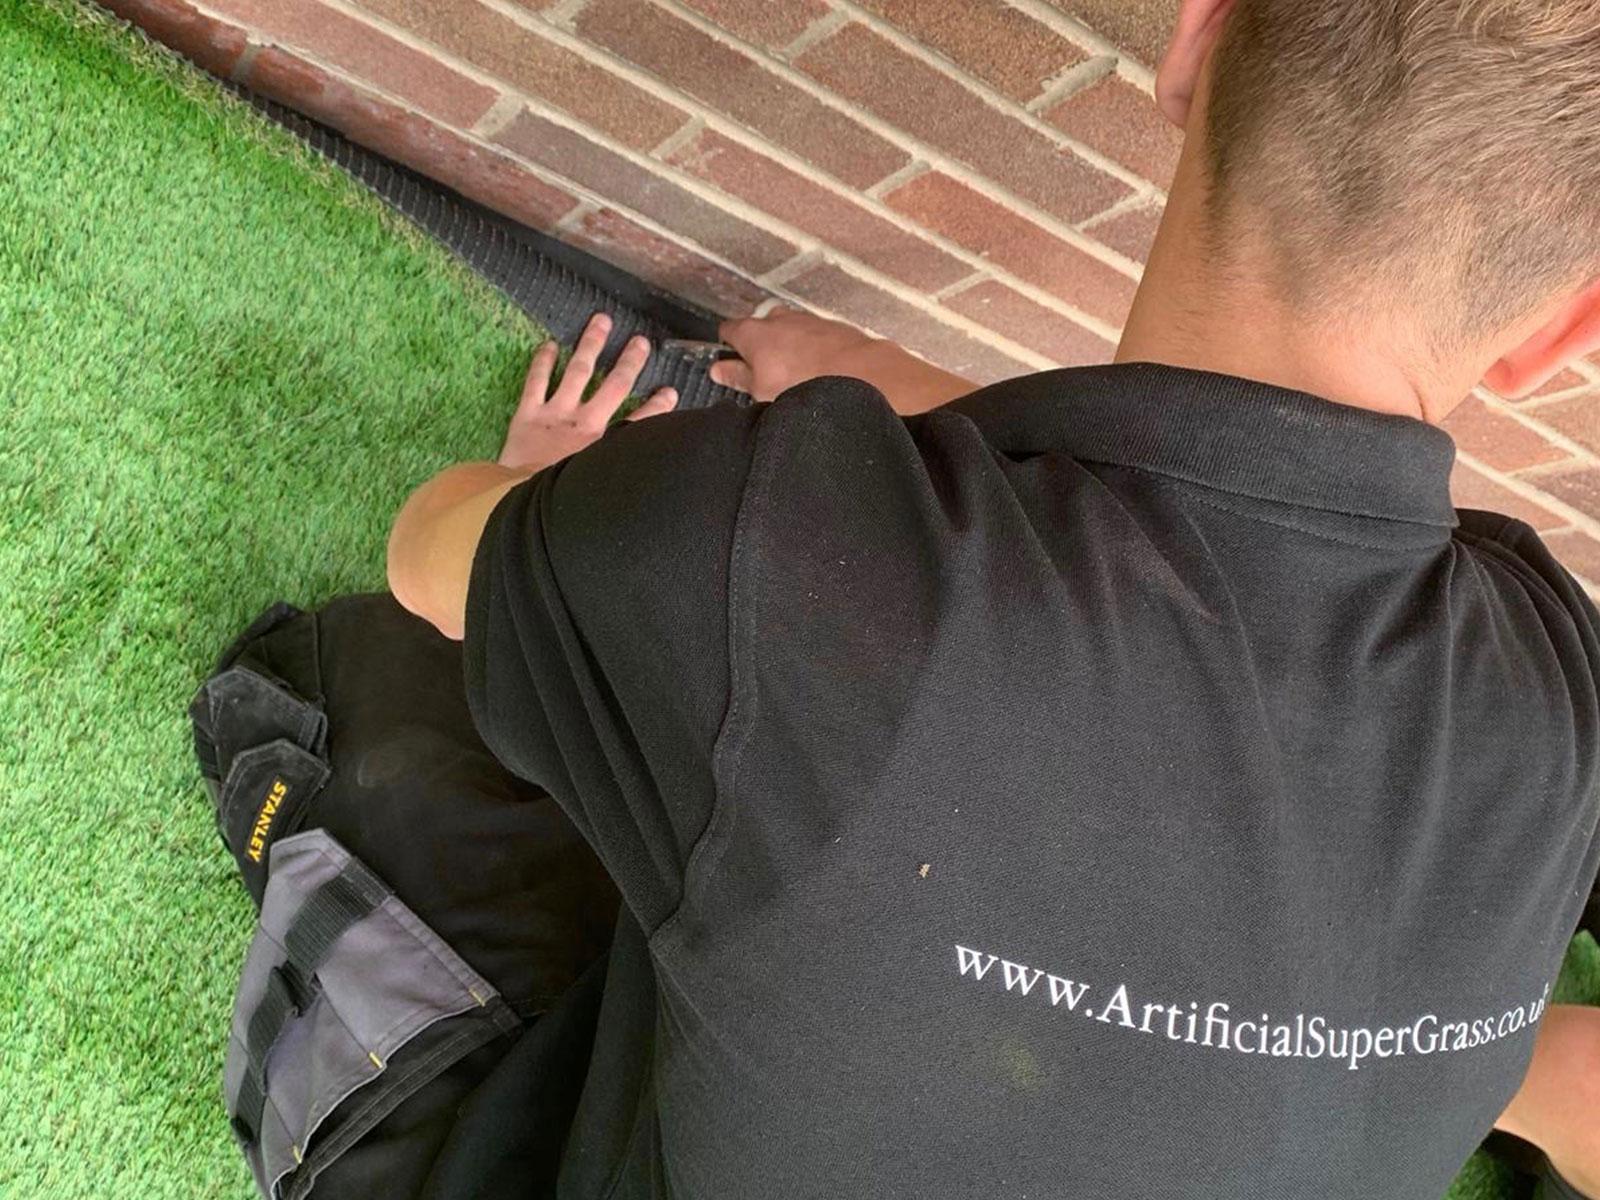 Best Quality Artificial Grass Headingley Artificial Super Grass